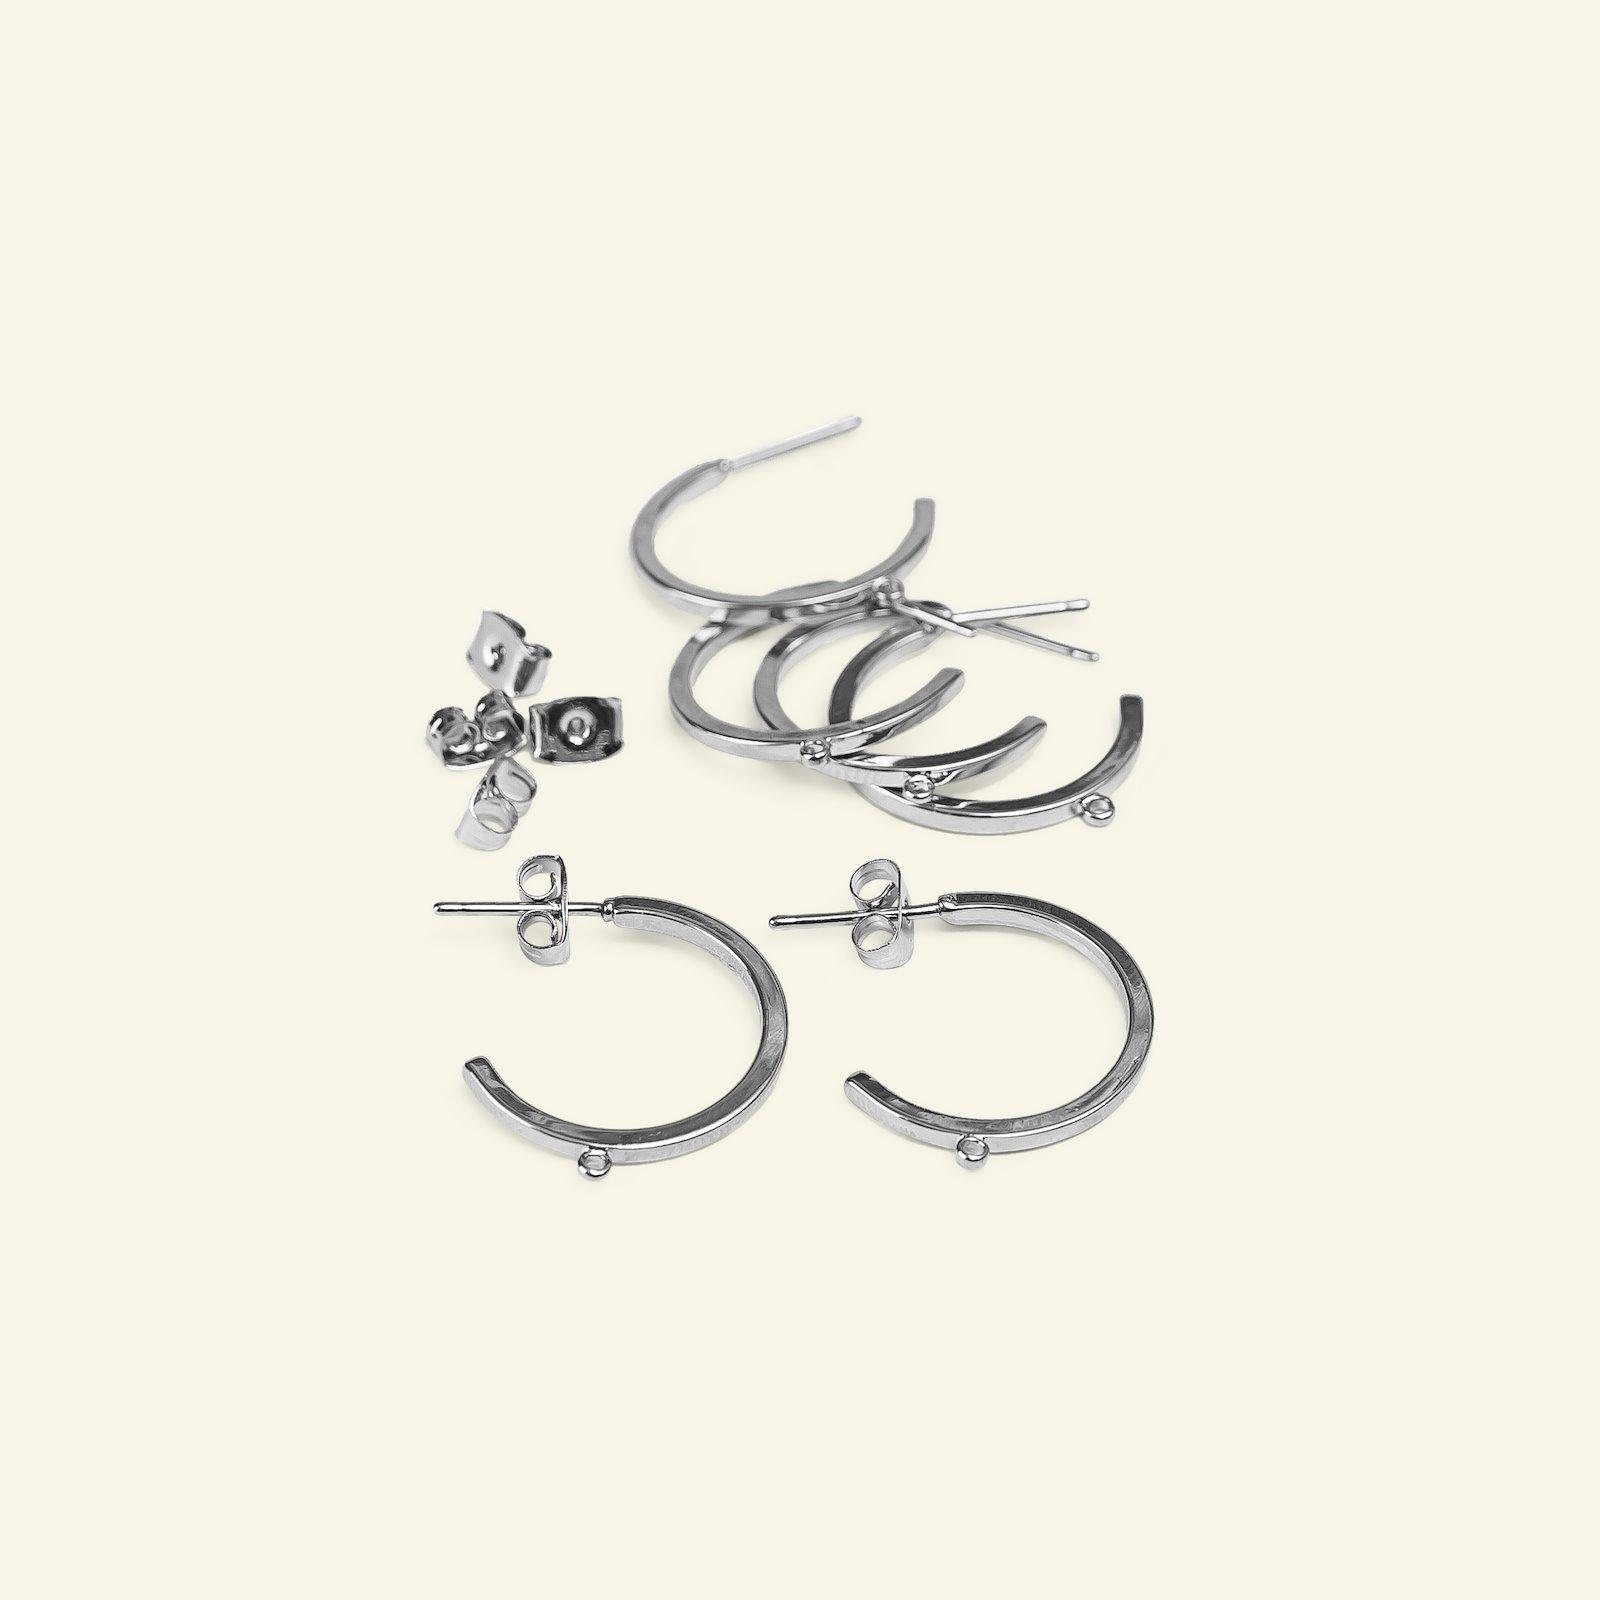 Ear ring hoops 21mm silver 6pcs 45381_pack